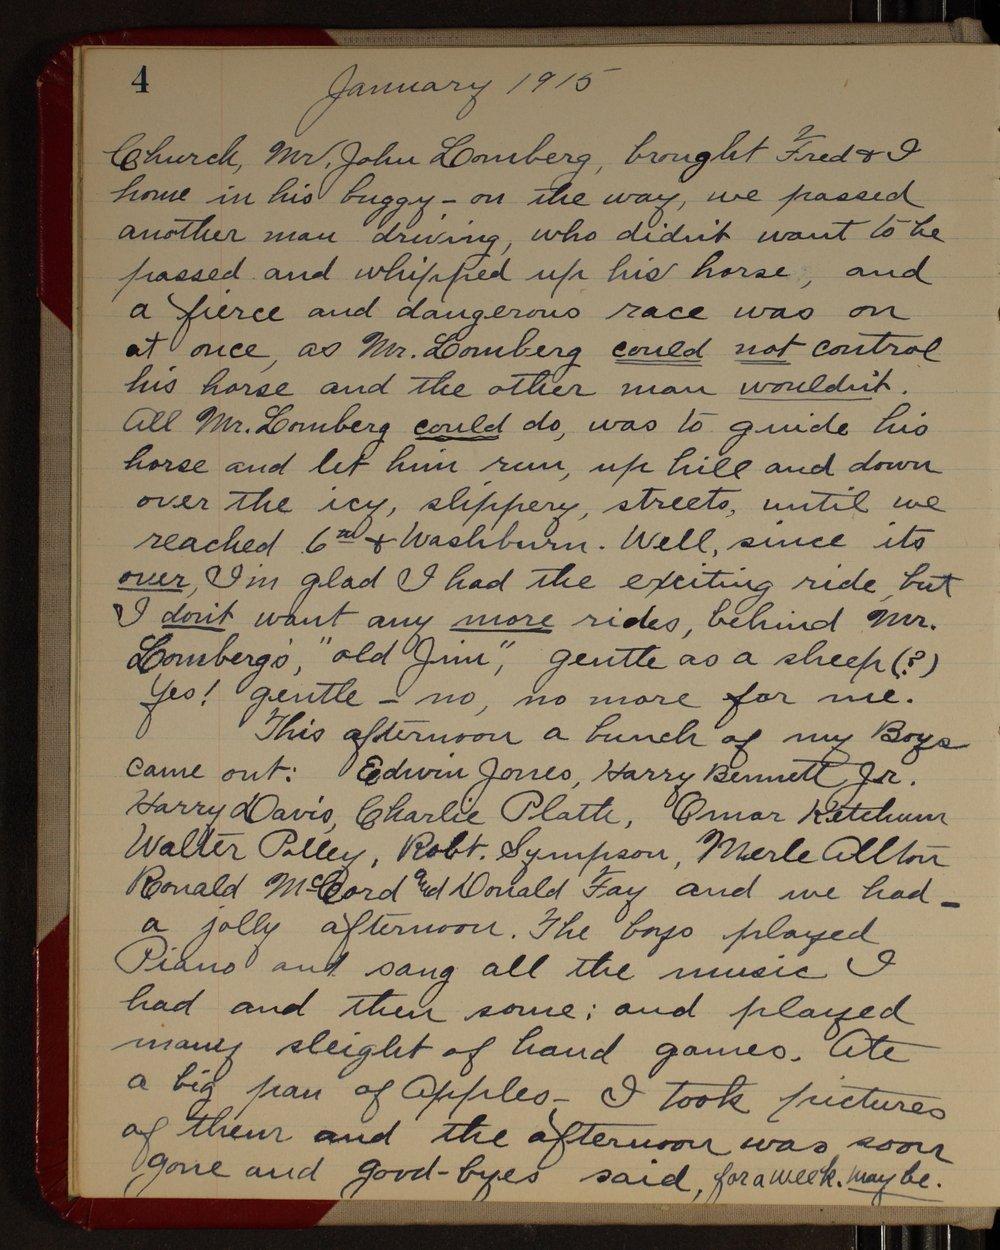 Martha Farnsworth diary - [page 4]